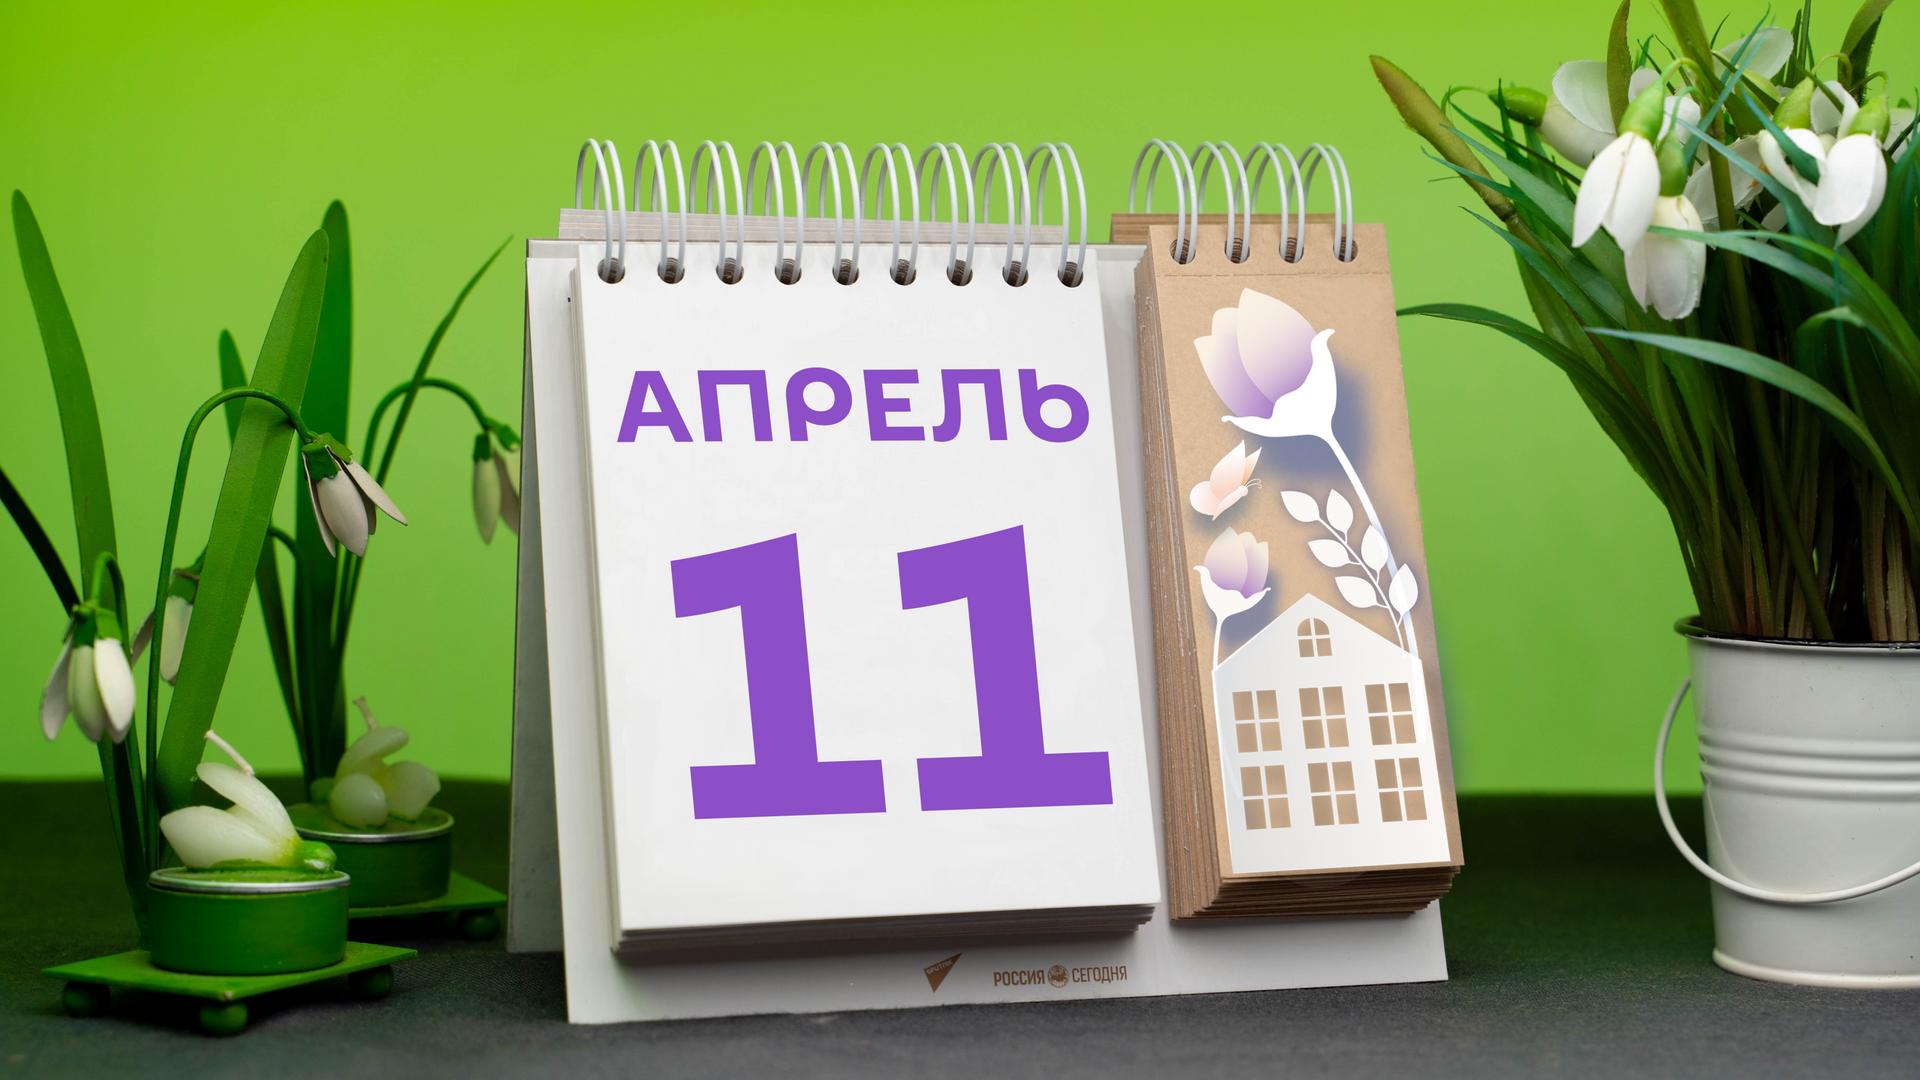 День 11 апреля - Sputnik Тоҷикистон, 1920, 11.04.2021